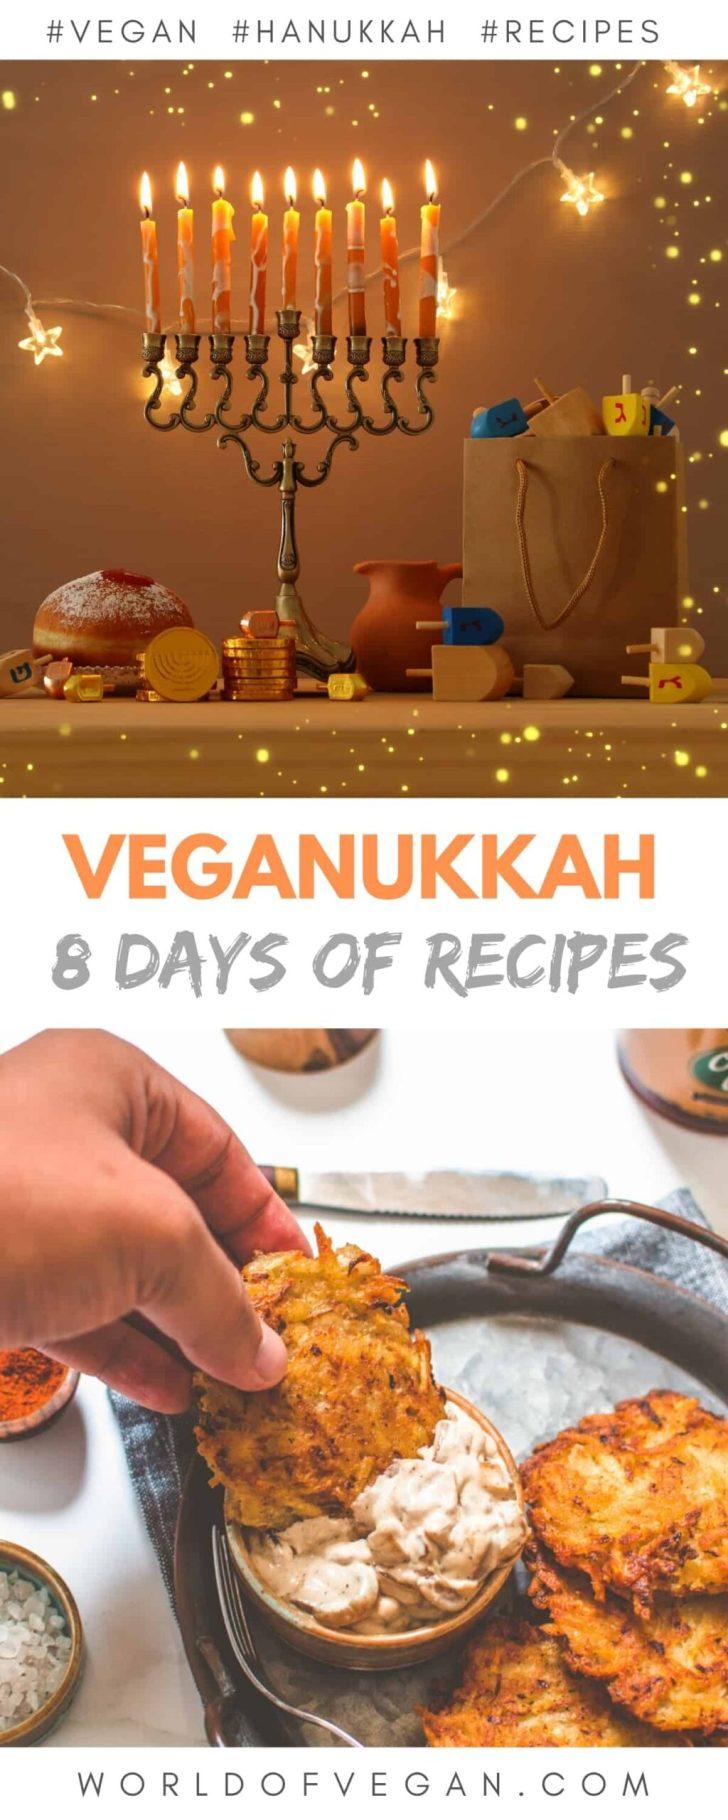 Vegan Hanukkah Recipes—One For Each Night